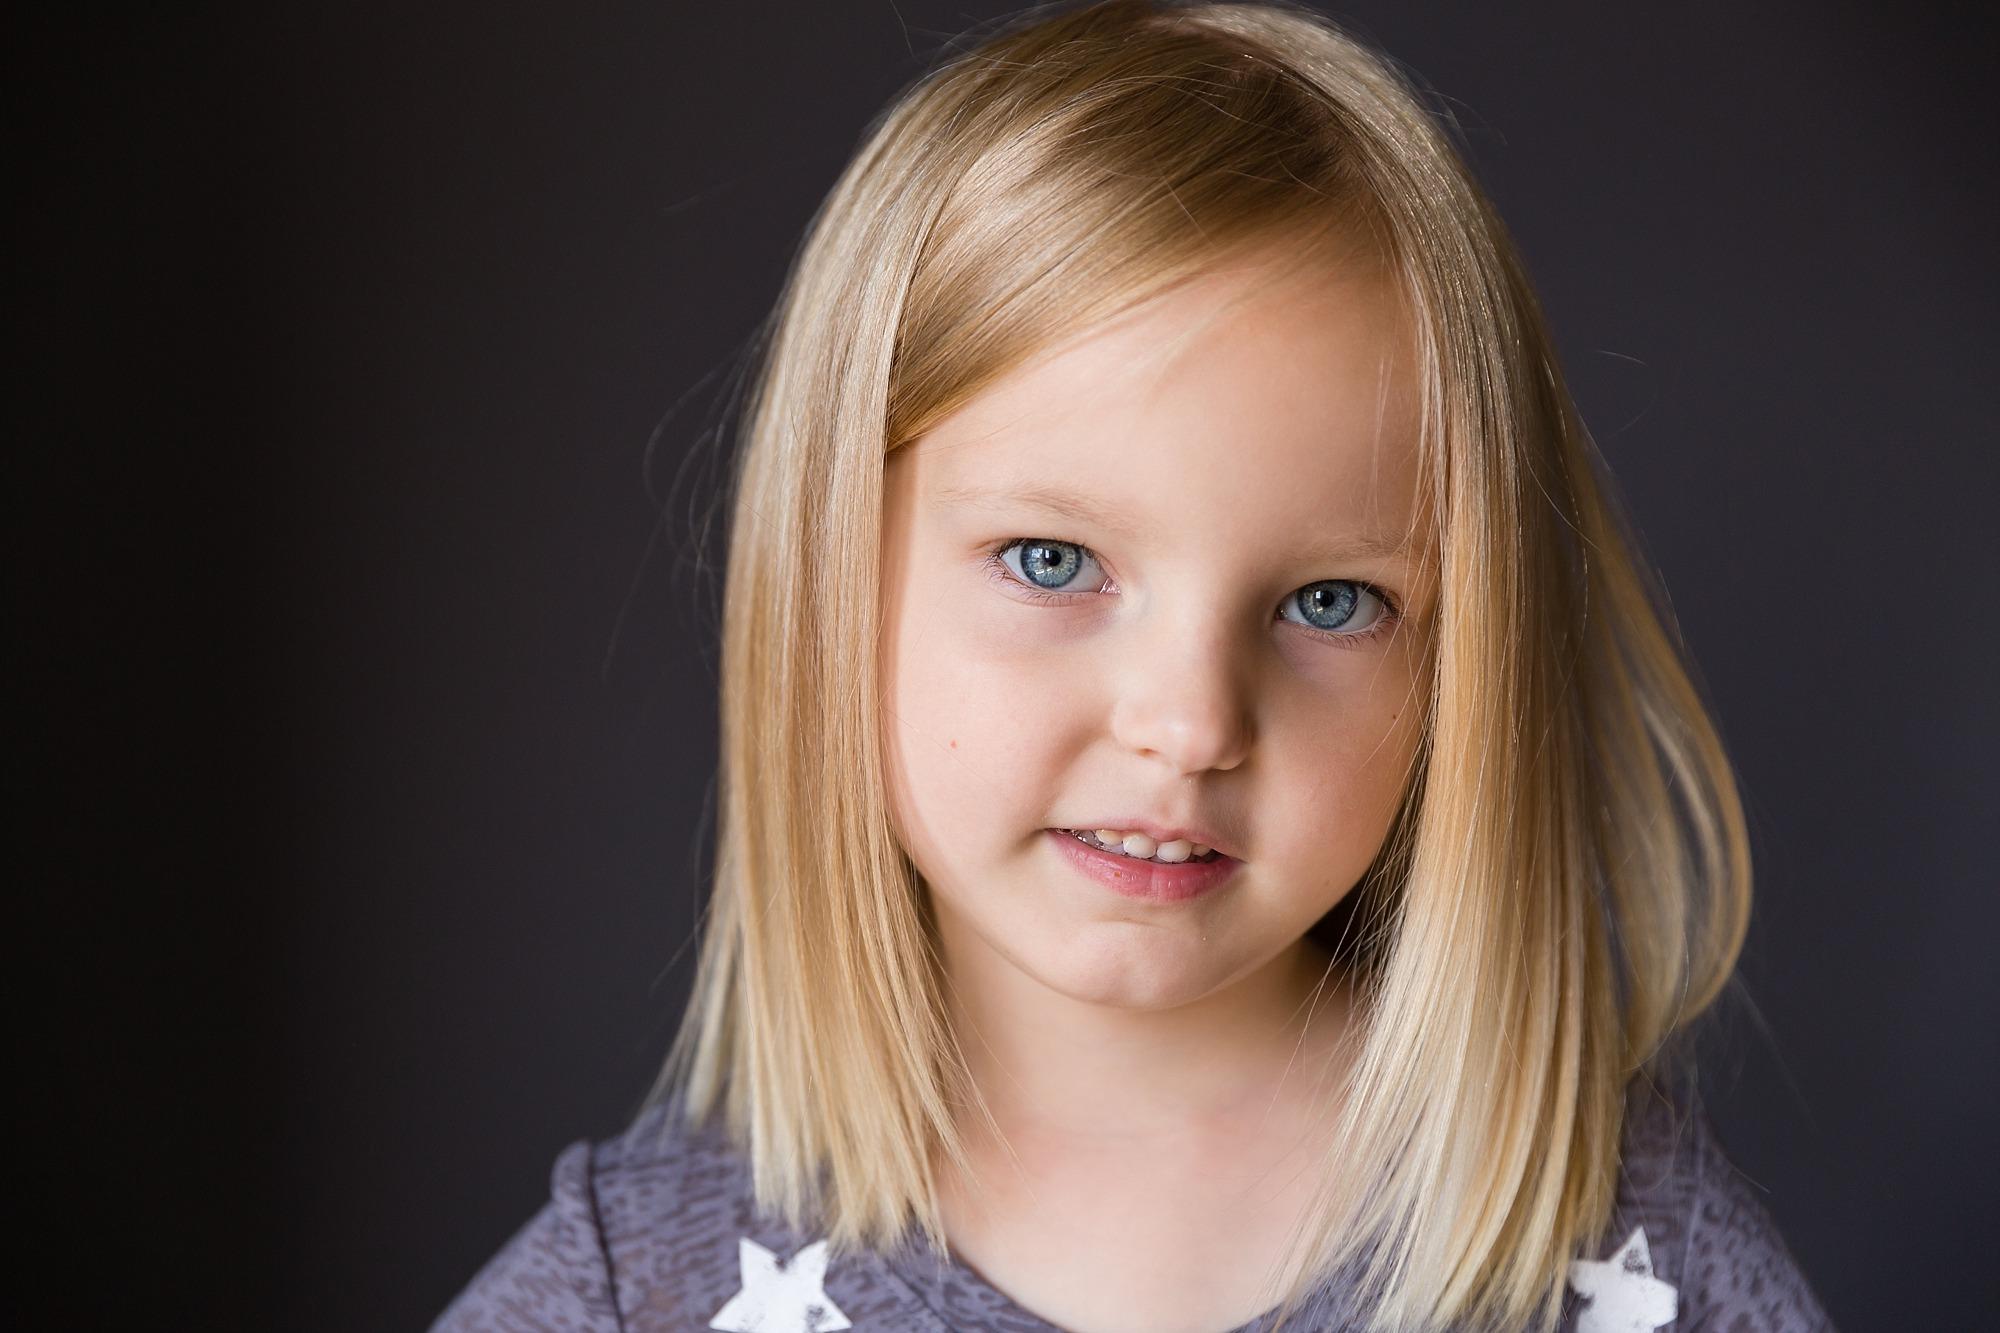 Modern_Childrens_Portraits_Hunnicutt_Photography_Collages_0005